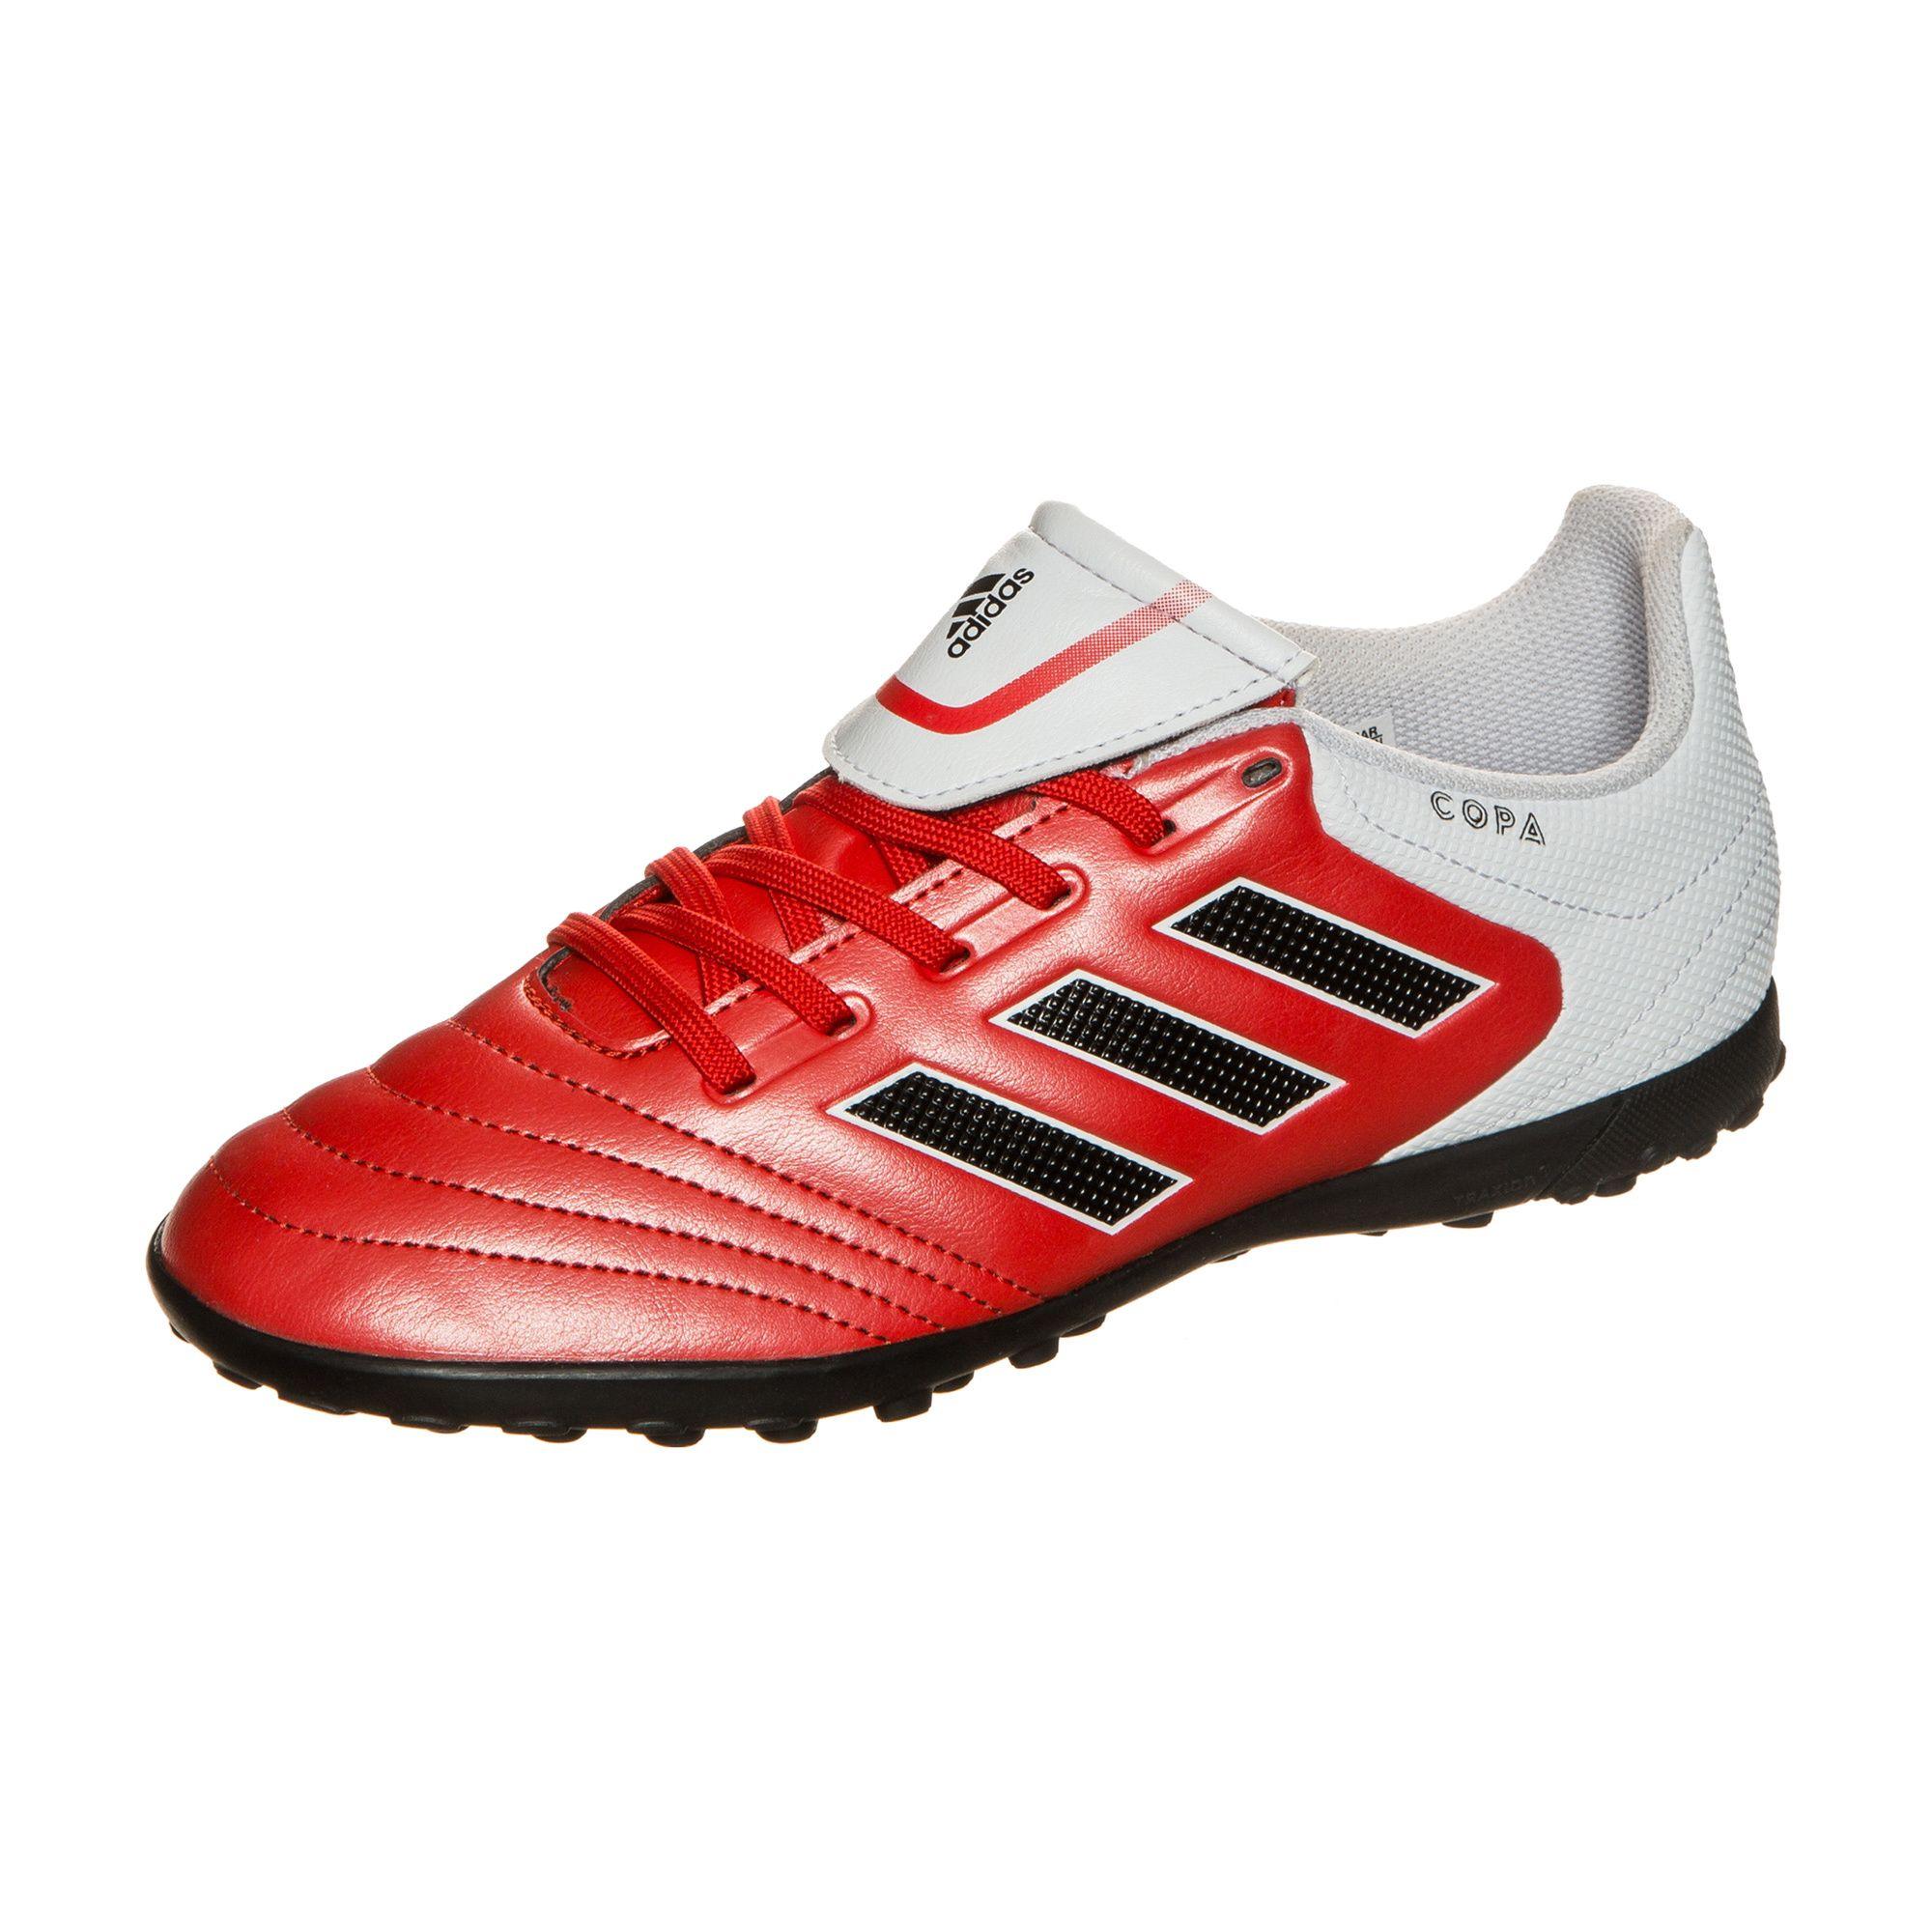 ADIDAS PERFORMANCE adidas Performance Copa 17.4 TF Fußballschuh Kinder